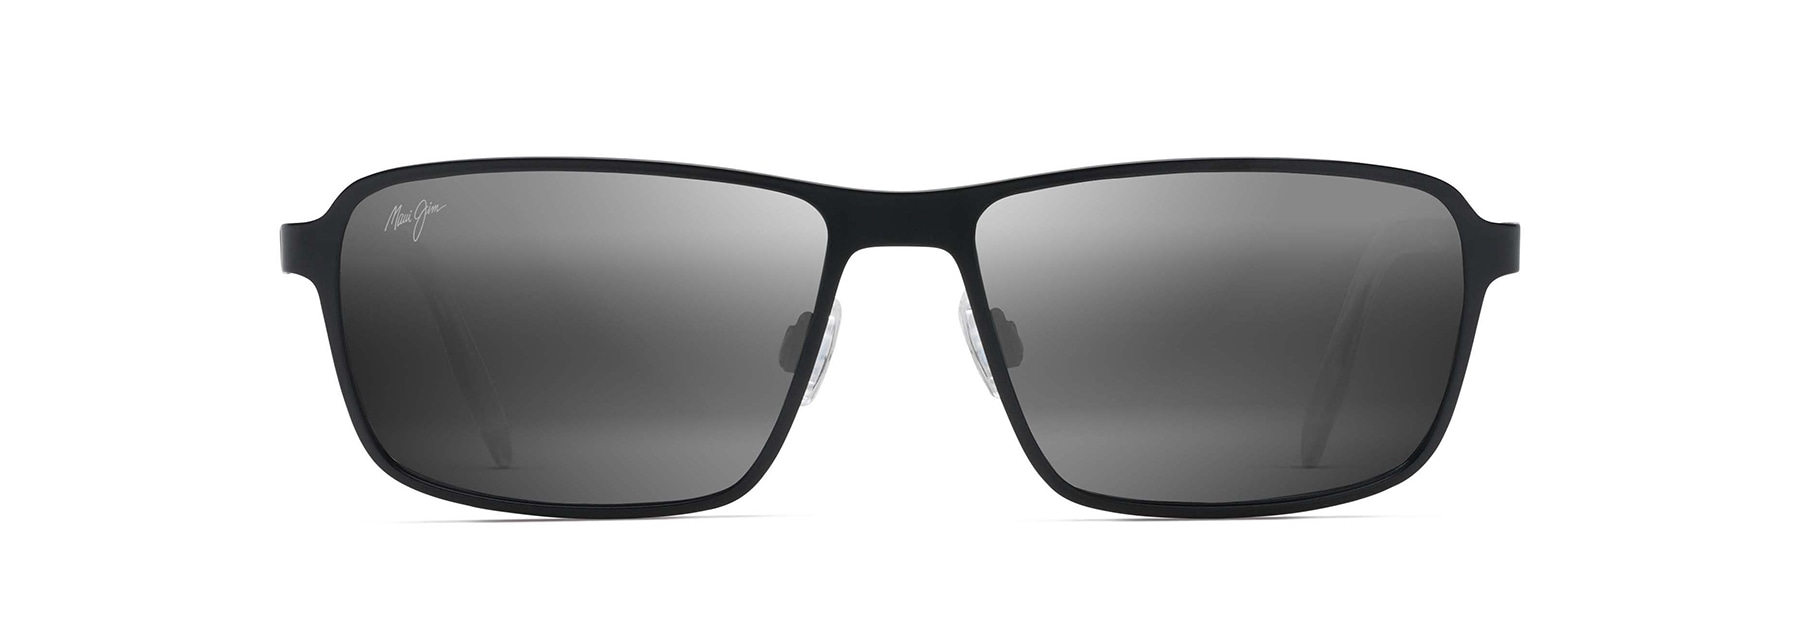 6bbecf23c34 Glass Beach Polarized Sunglasses | Maui Jim®